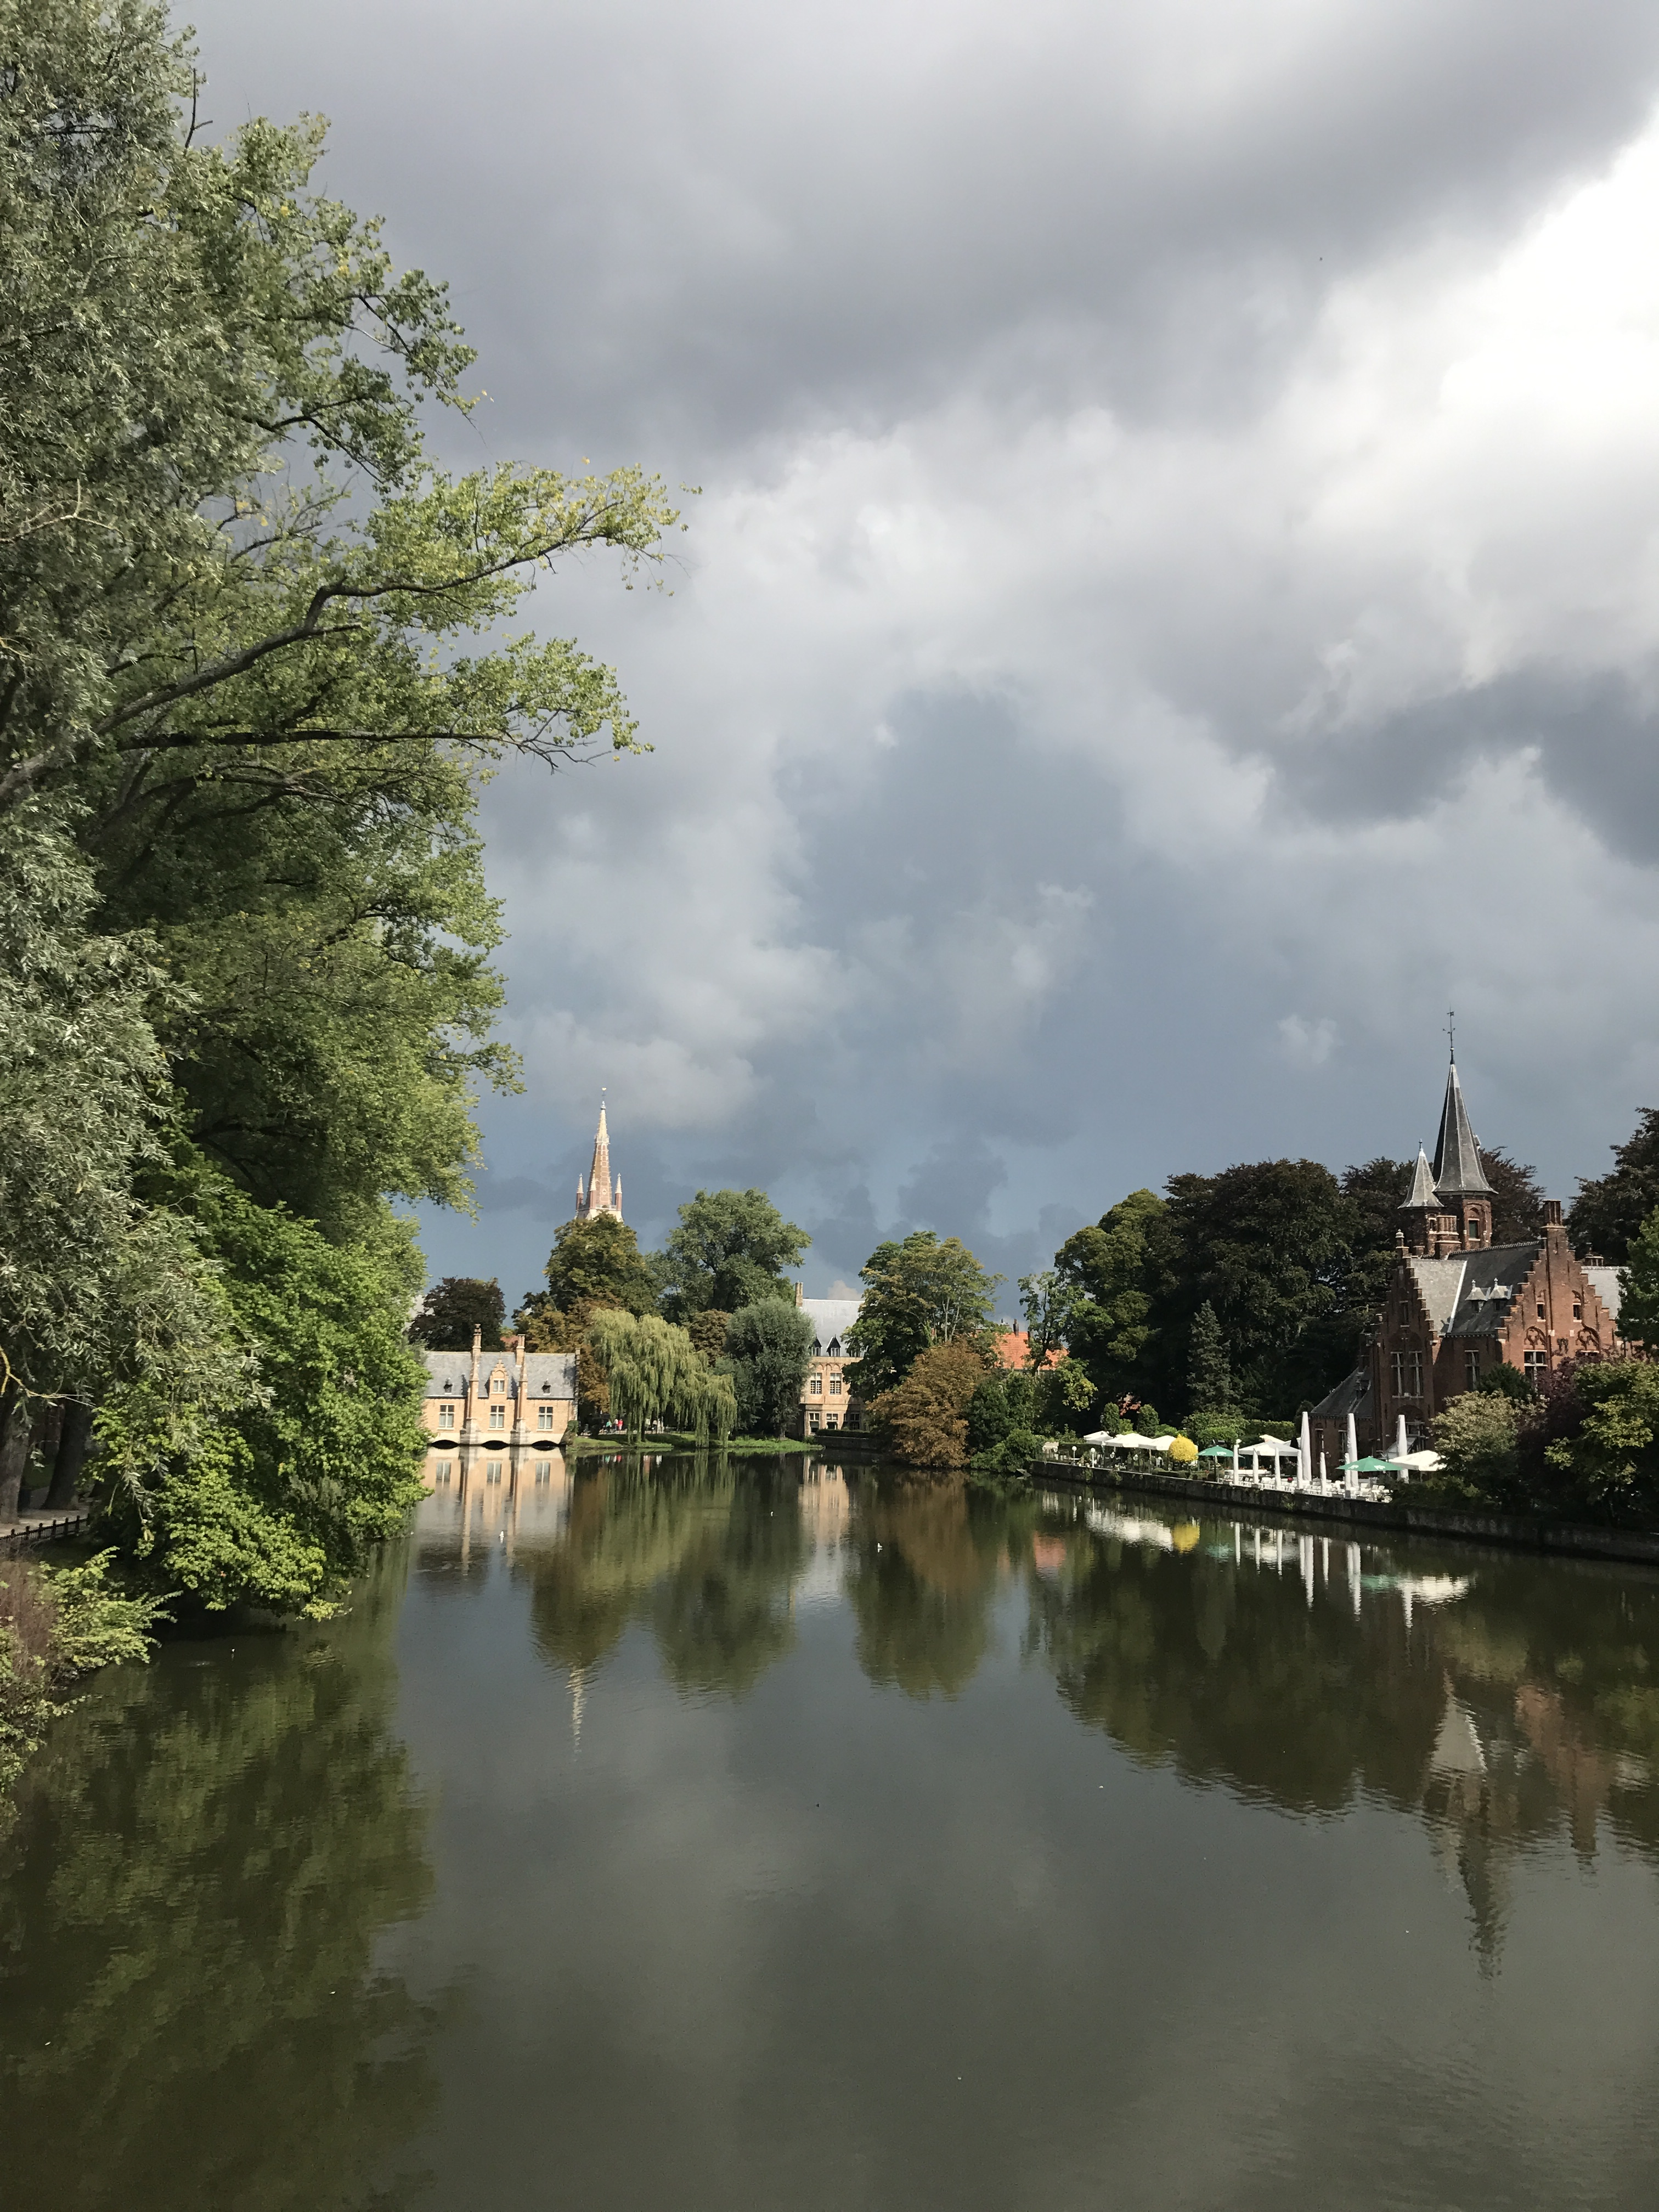 Brugge – Romantic &  Historical